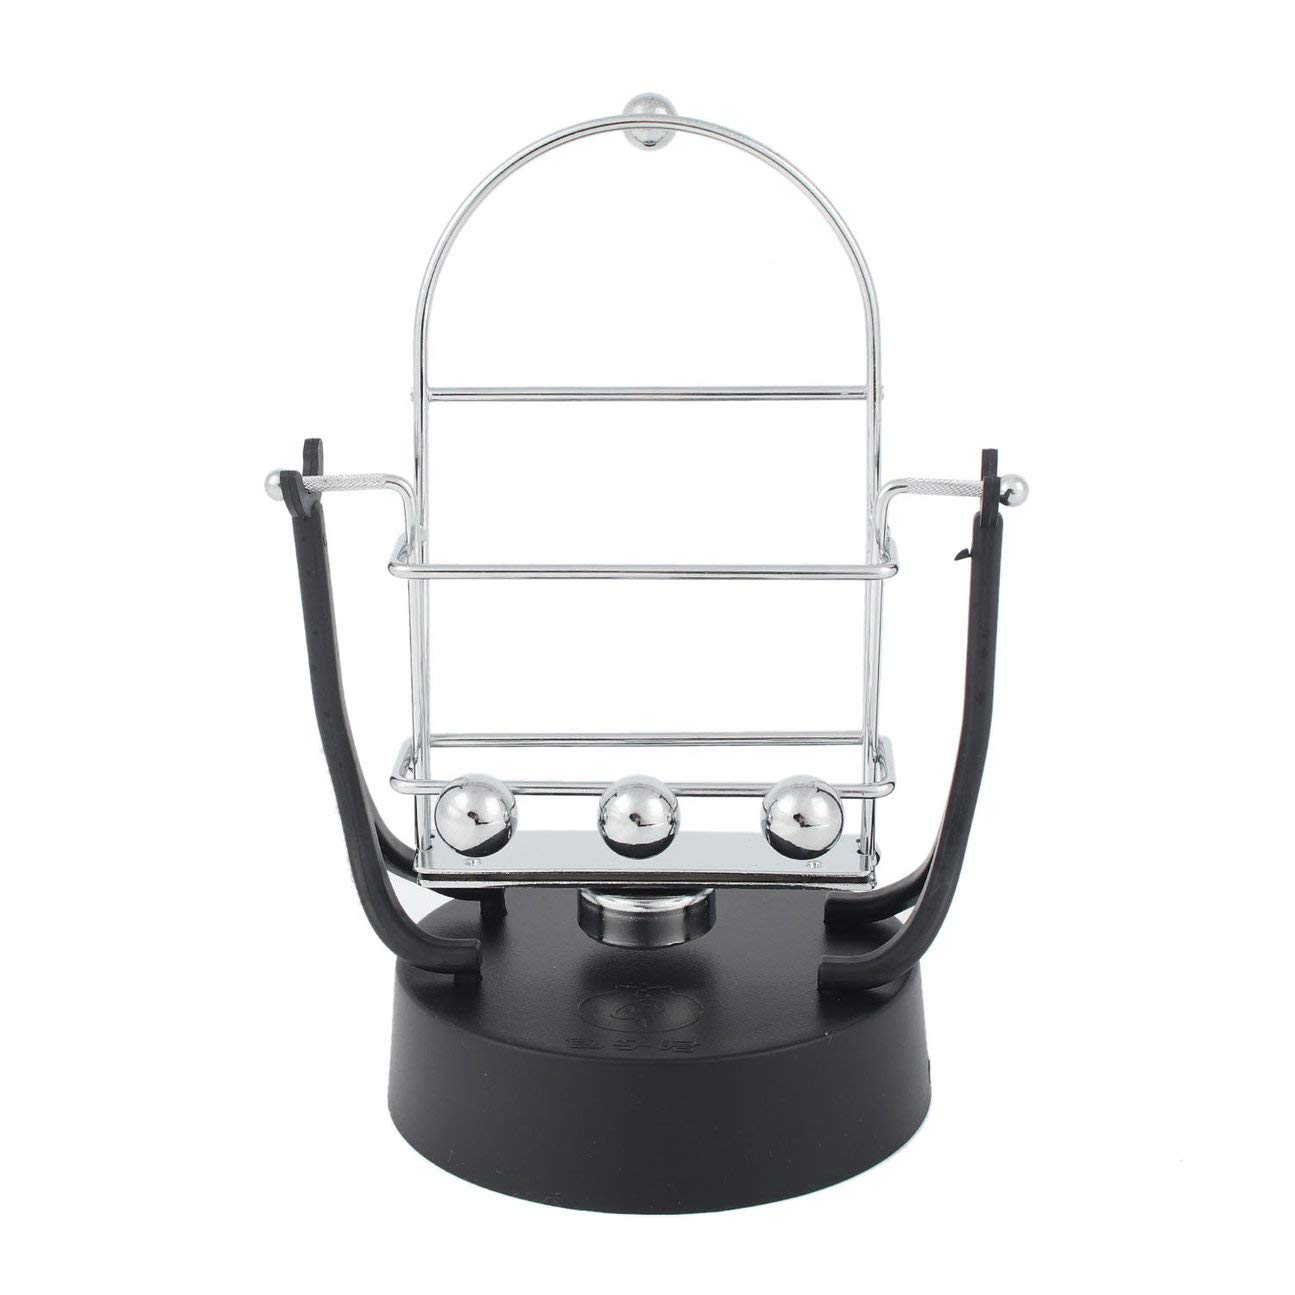 MachinYeser Dispositivo de p/éndulo de Base para tel/éfono Celular Juguete Educativo de p/éndulo de Equilibrio din/ámico Plata y Negro